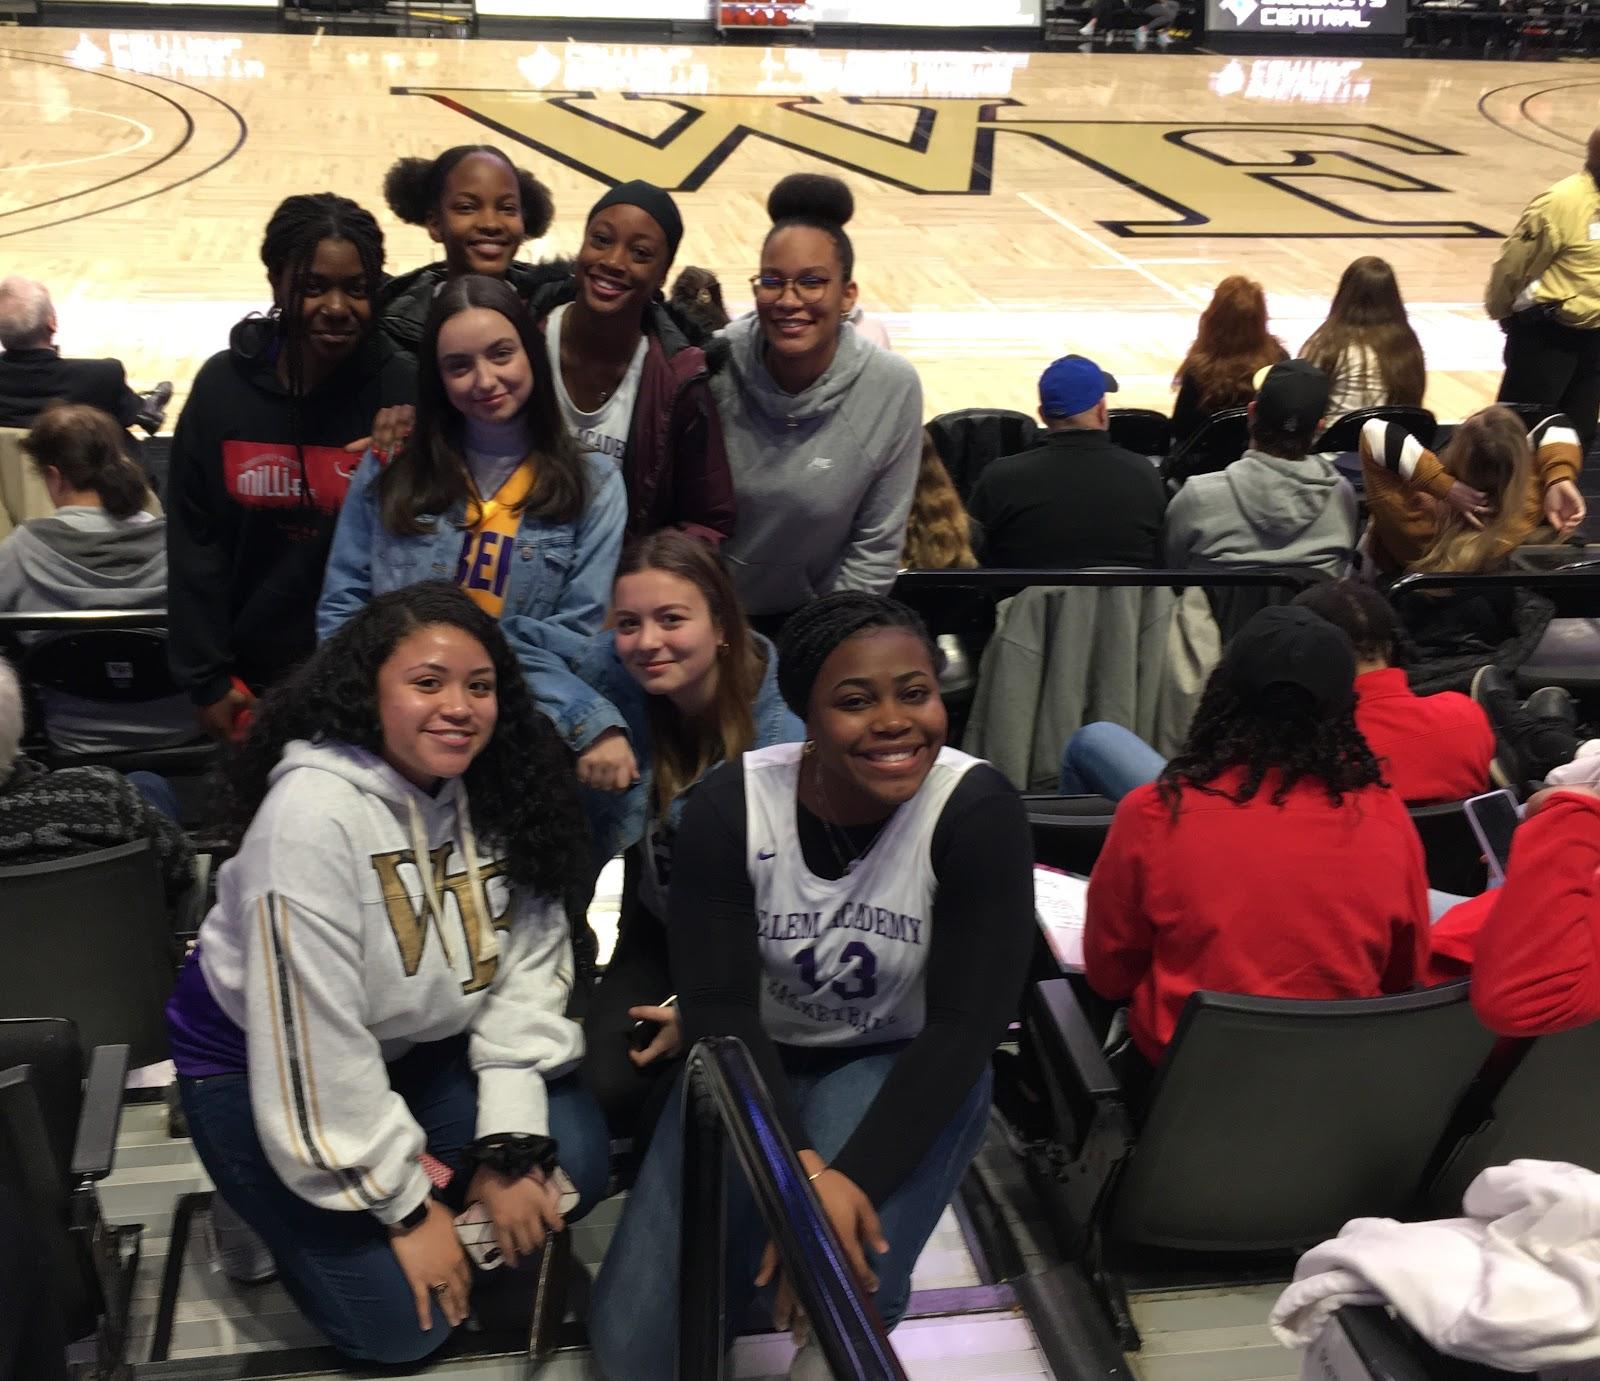 Students at WFU game